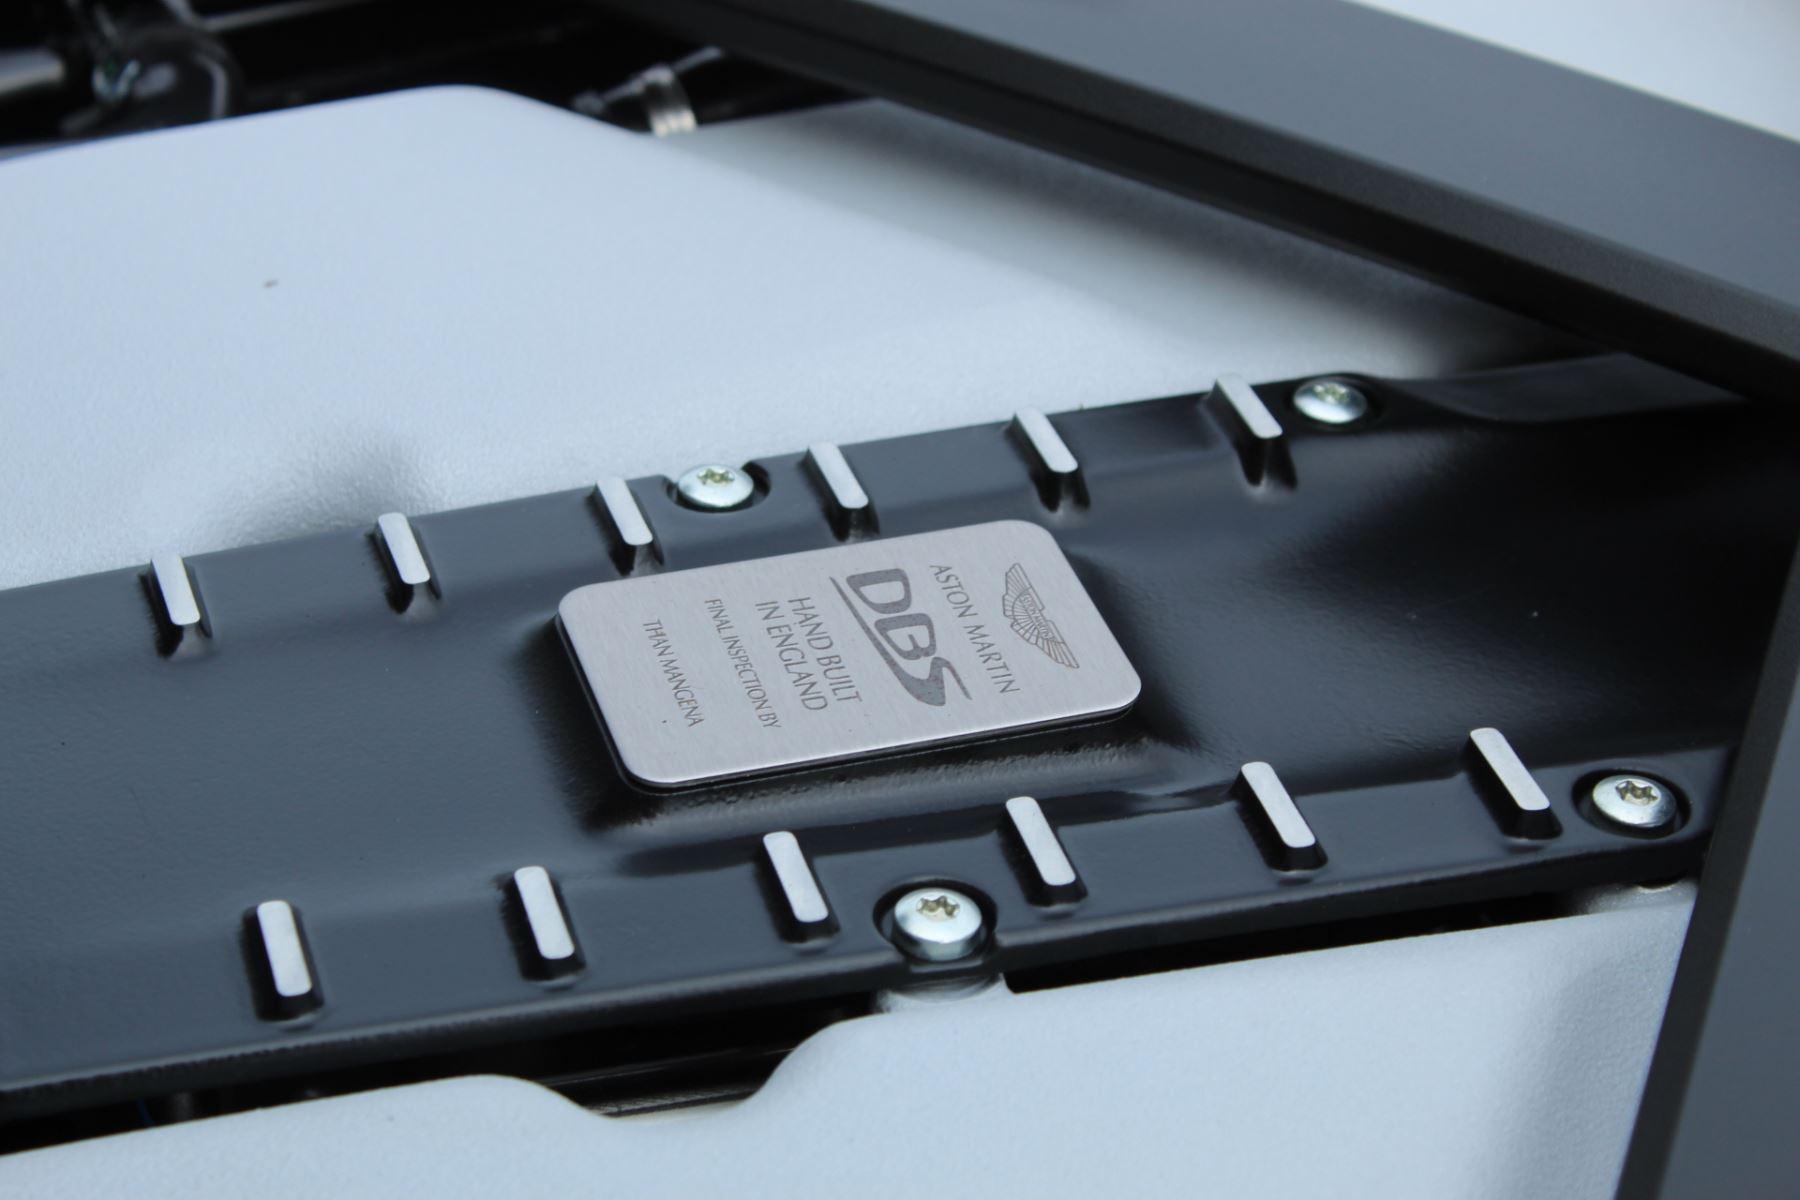 Aston Martin DBS V12 Superleggera 2dr Touchtronic image 39